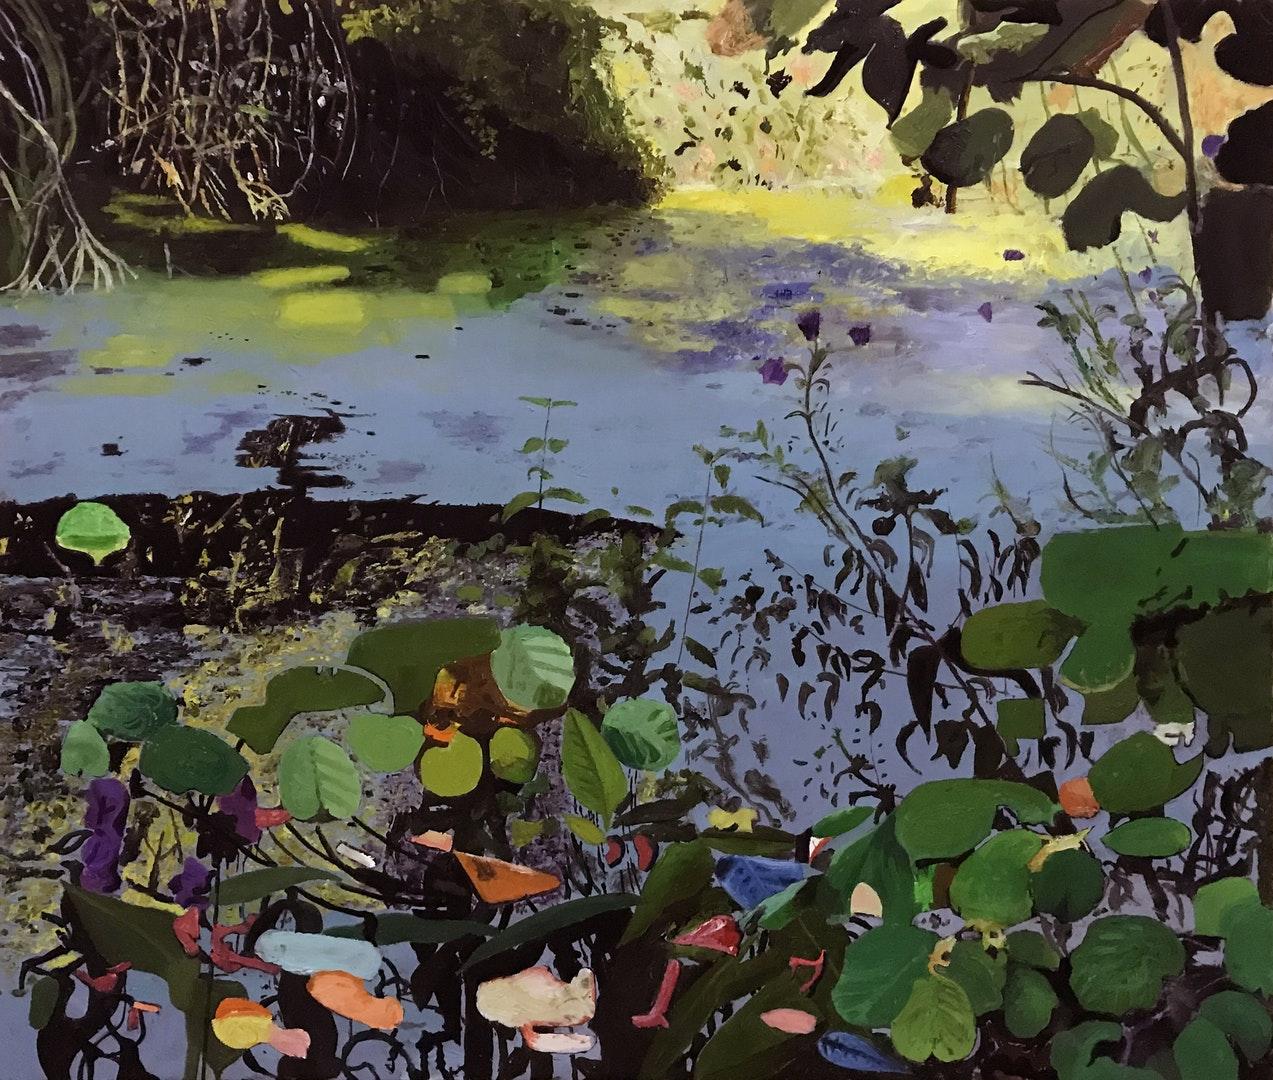 Iain Nicholls  Elsecar Canal  Oil on canvas, 91 x 122 x 3 cm  http://www.iain-nicholls.com